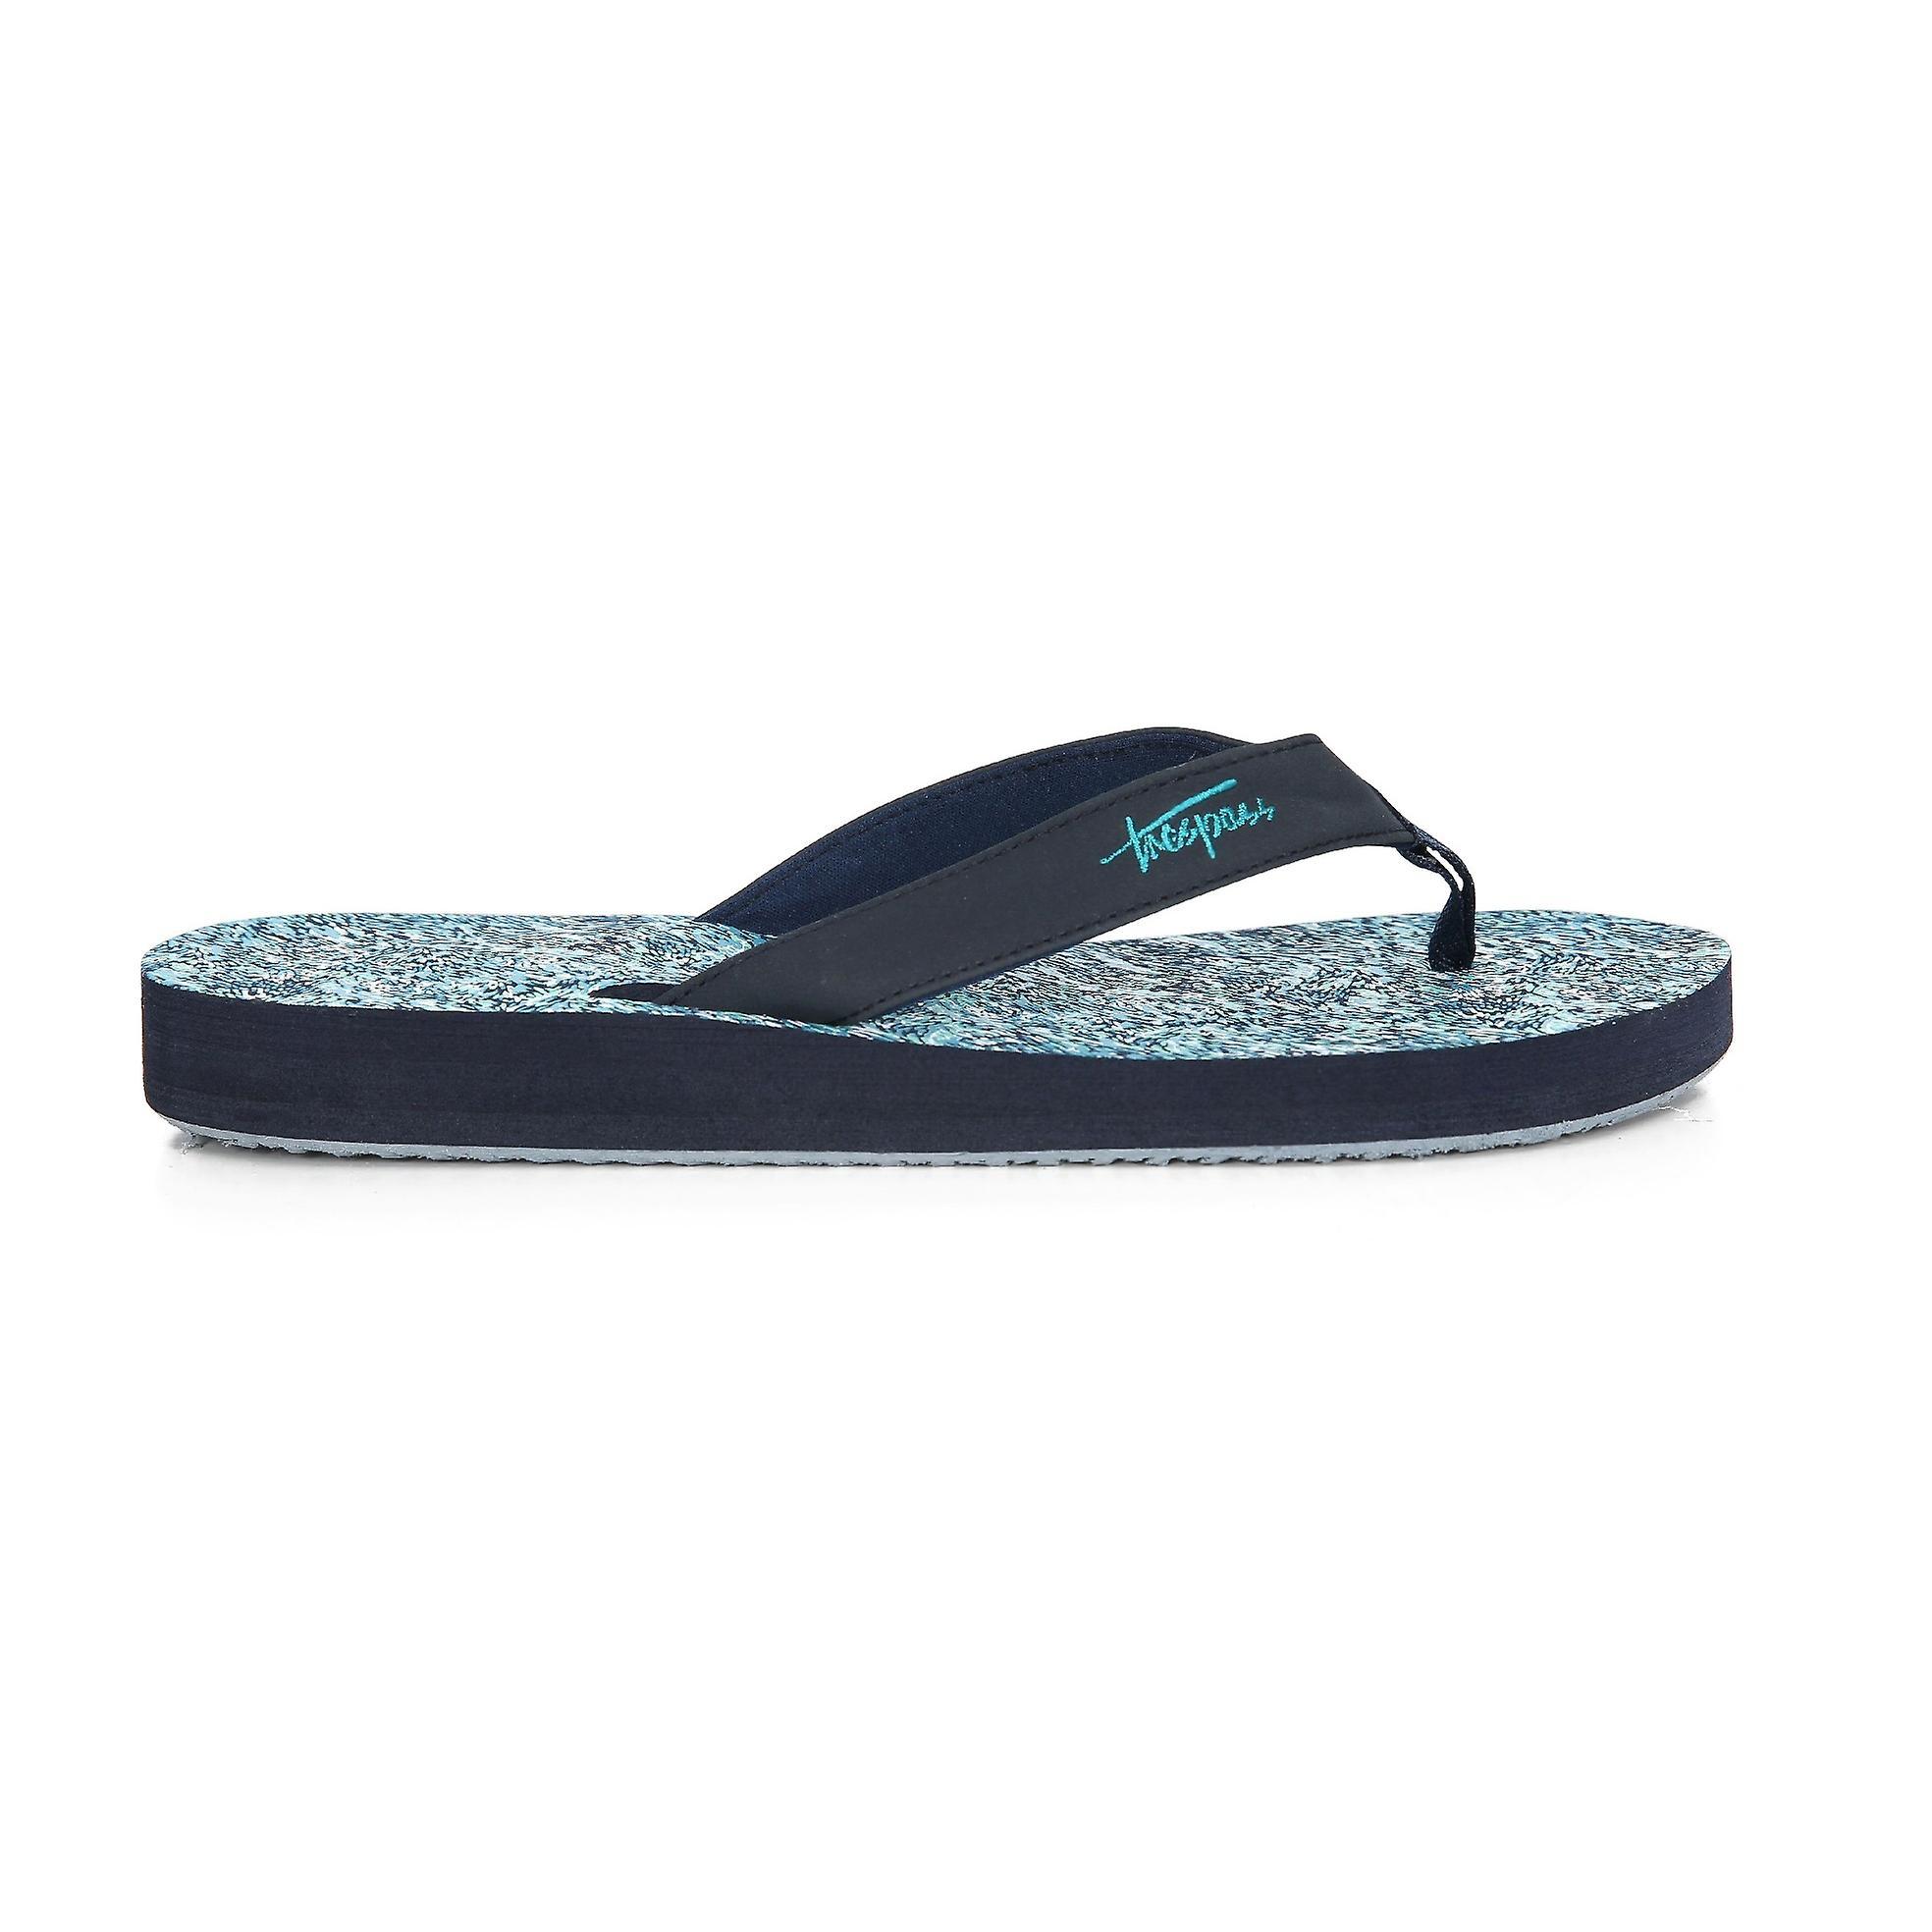 Trespass Womens/ladies Caladesi Flip Flops